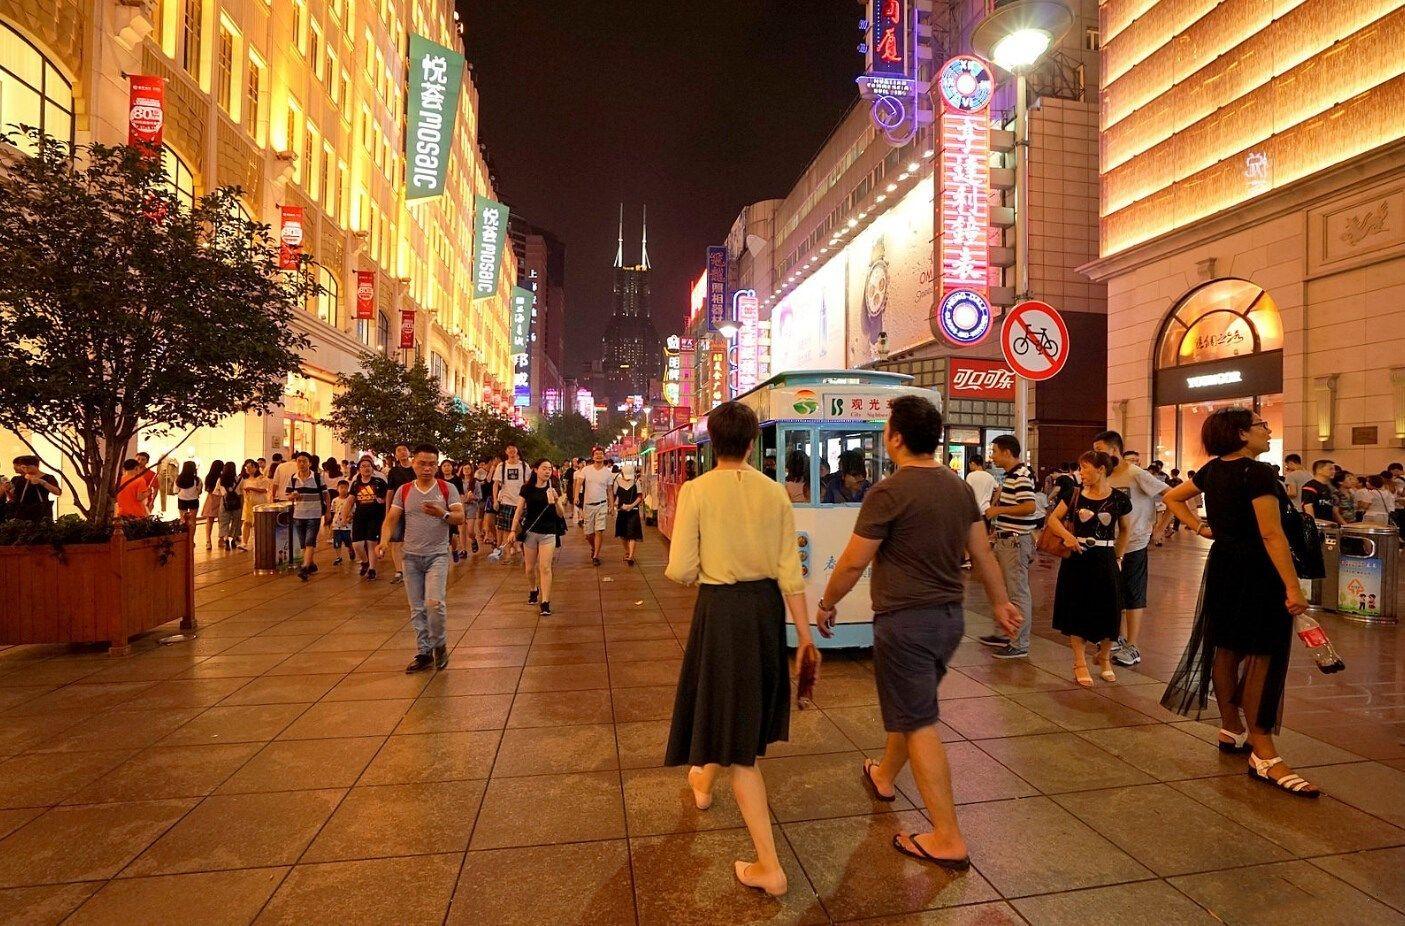 Shanghai Night Tour: Huangpu River Cruise & Nanjing Road